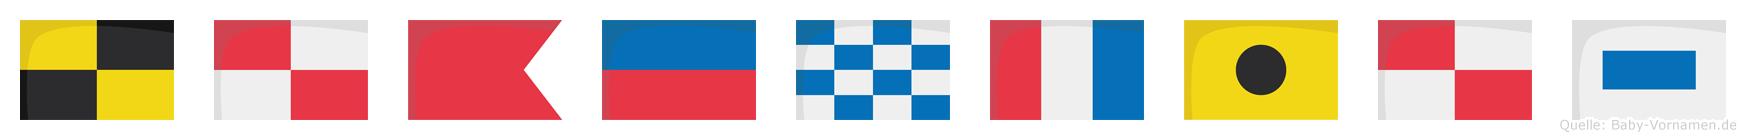 Lubentius im Flaggenalphabet